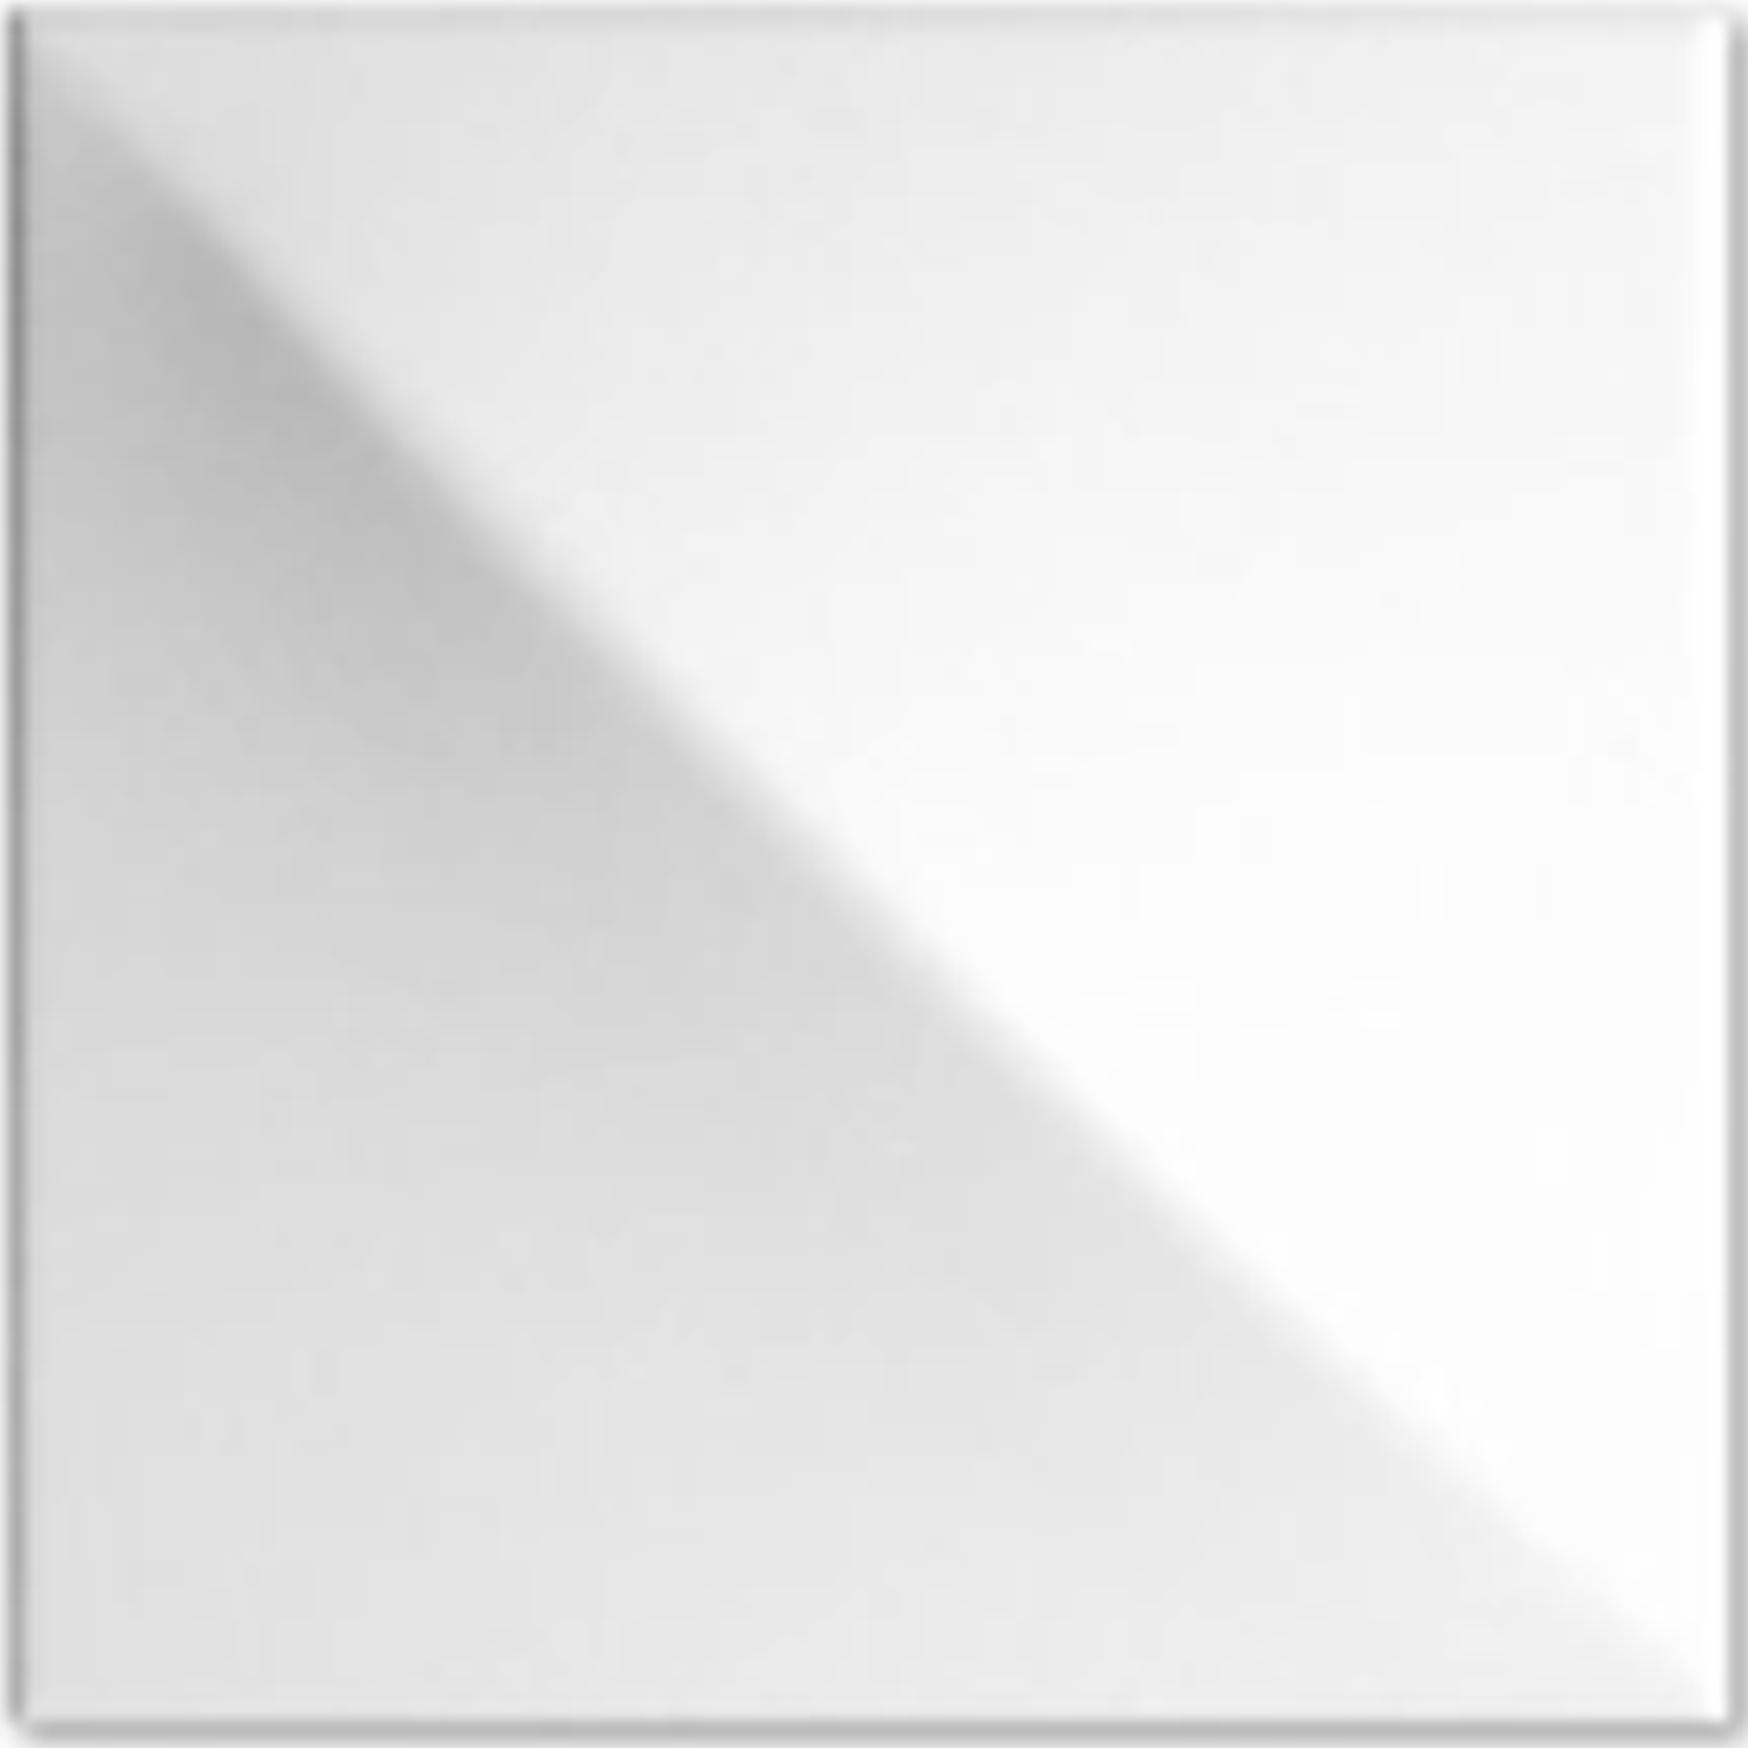 Slide Blanco 14.8x14.8 cm